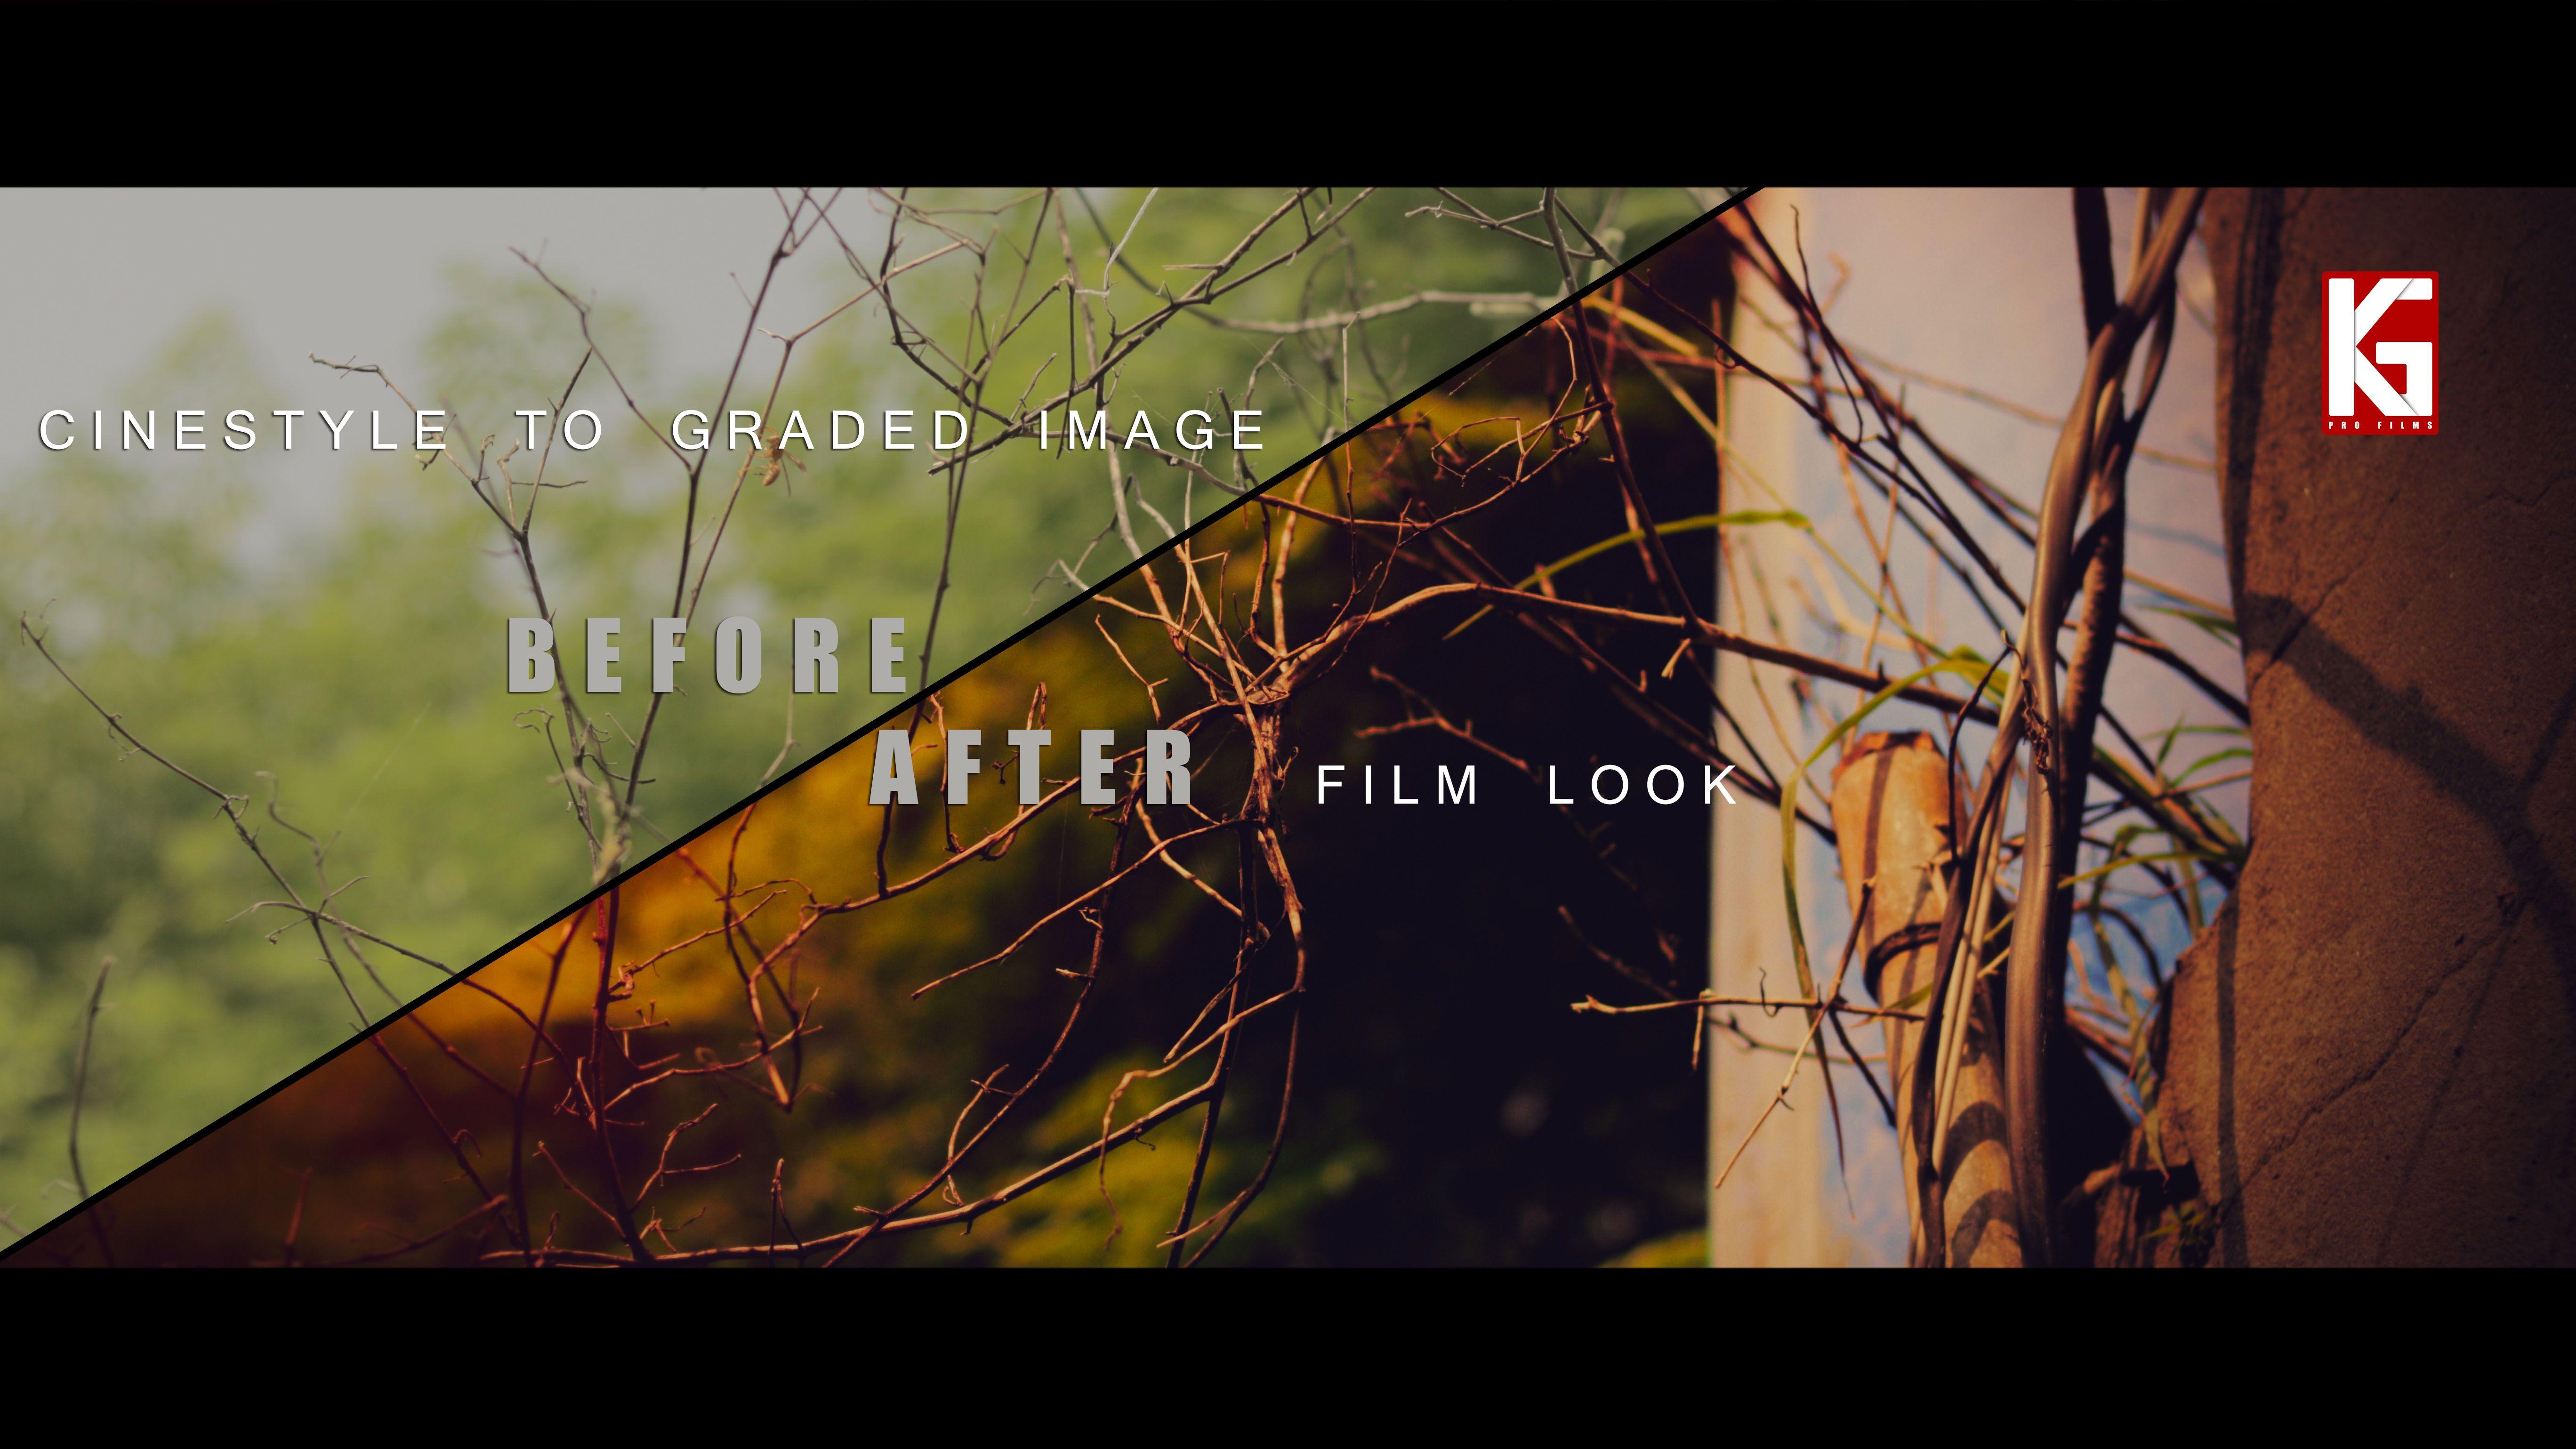 cinestyle to graded image | cinematic film look | Desktop screenshot